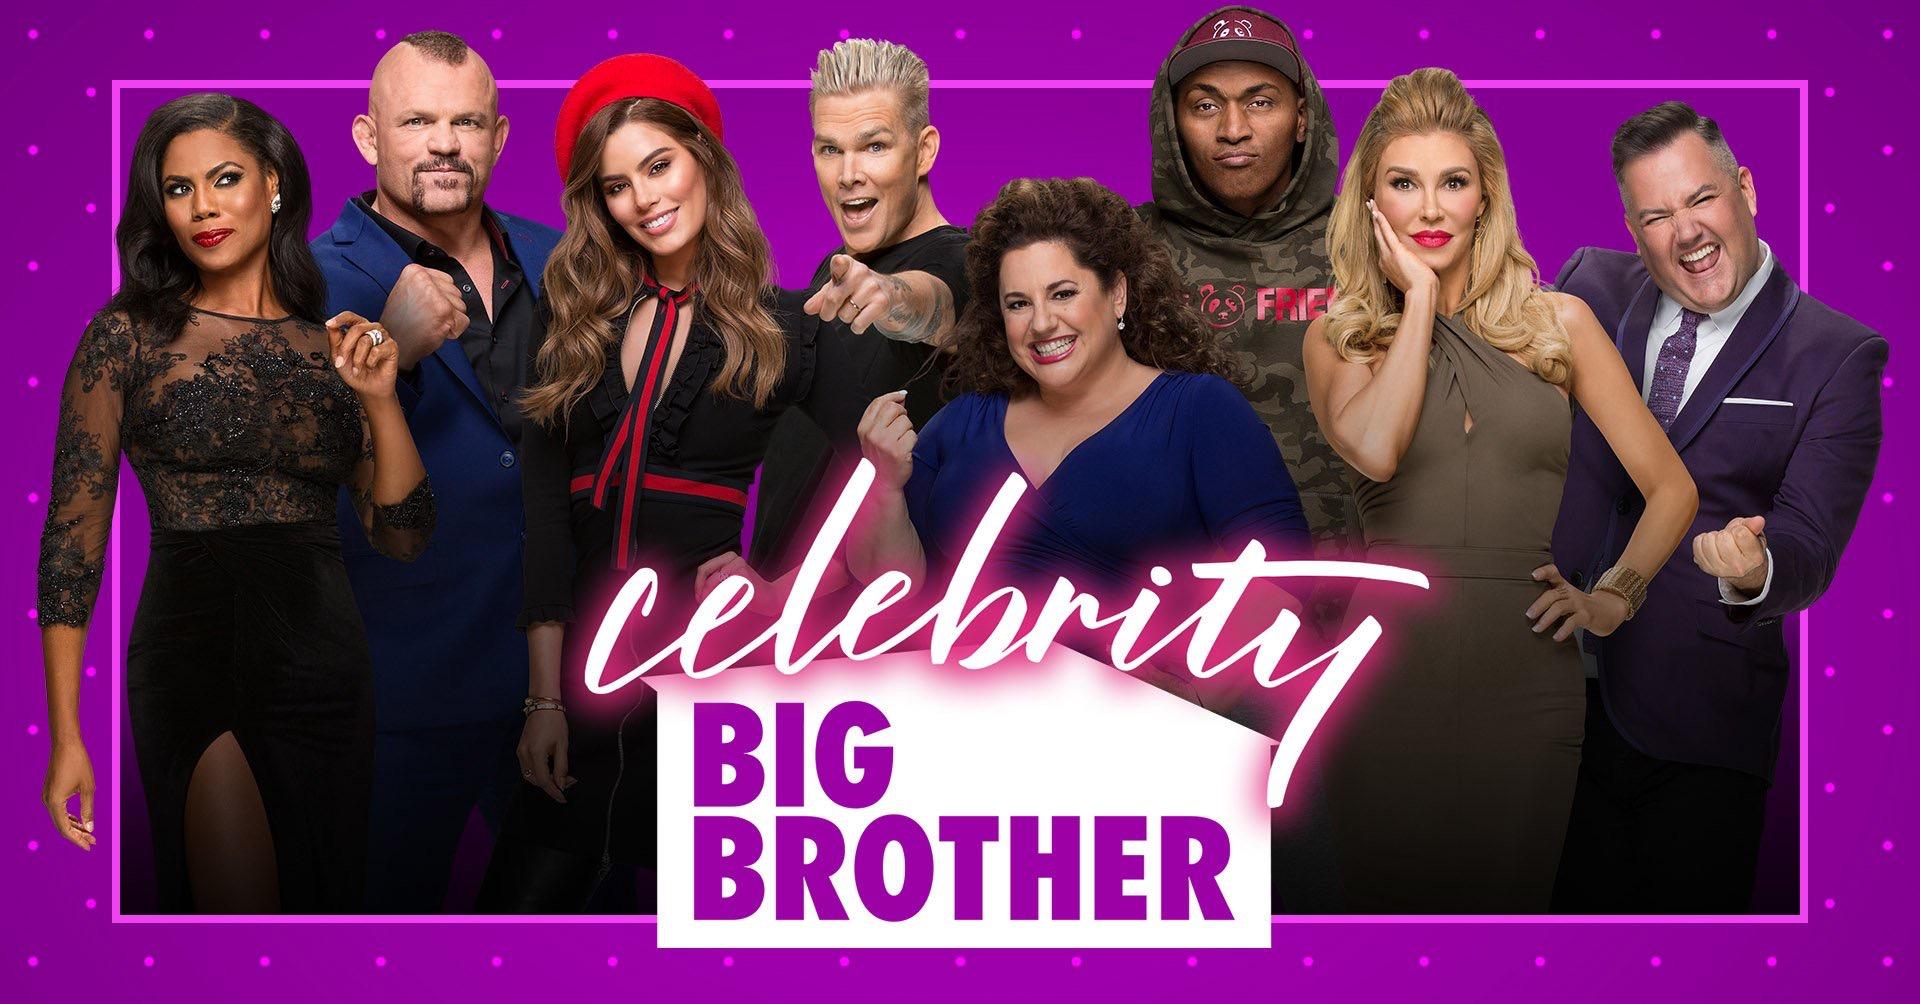 Big Brother (U.S. TV series) - Wikipedia